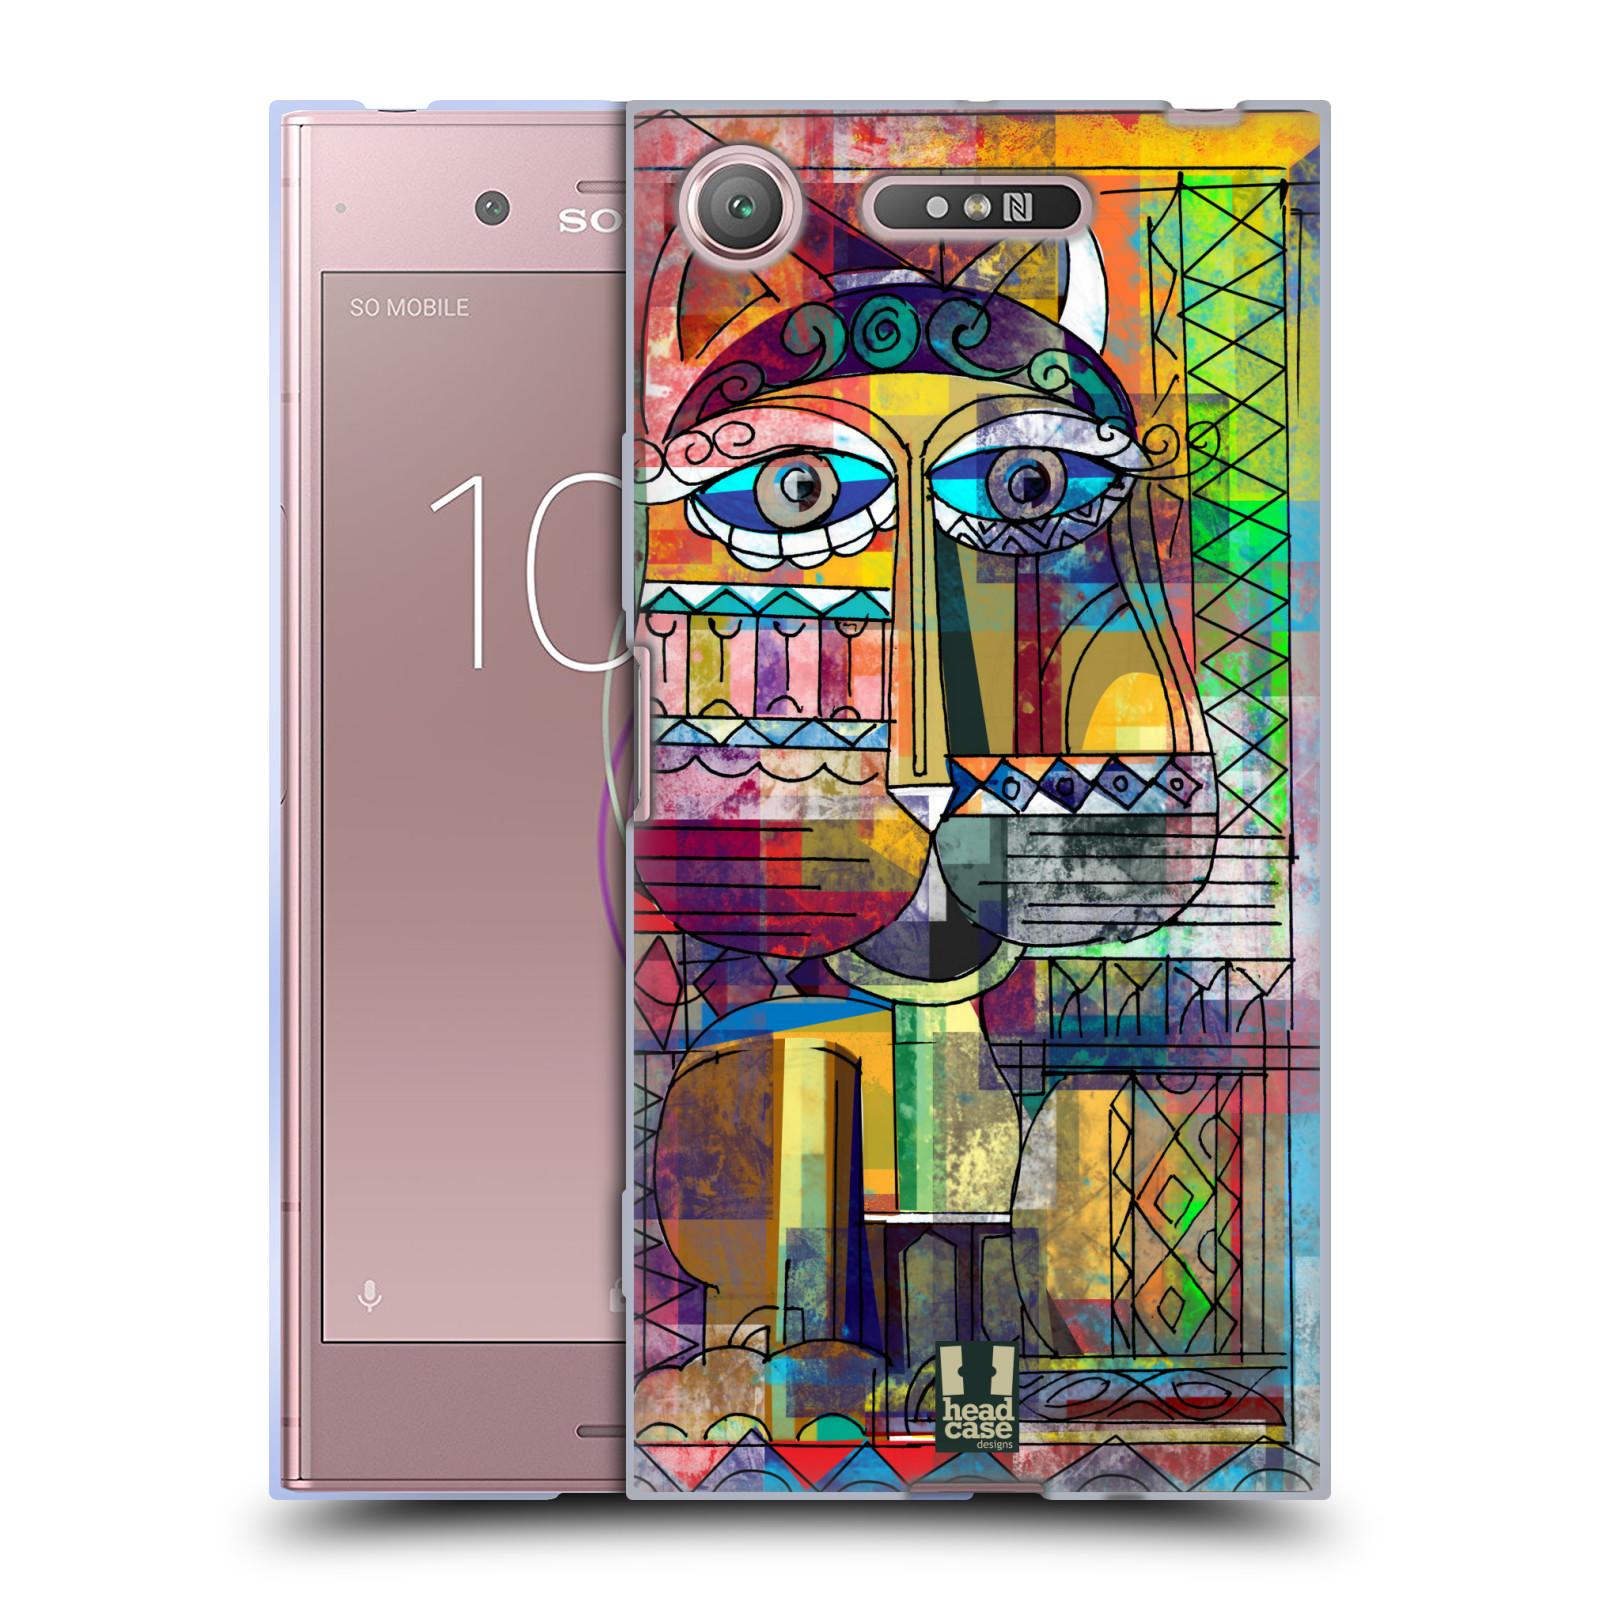 Silikonové pouzdro na mobil Sony Xperia XZ1 - Head Case - AZTEC KORAT